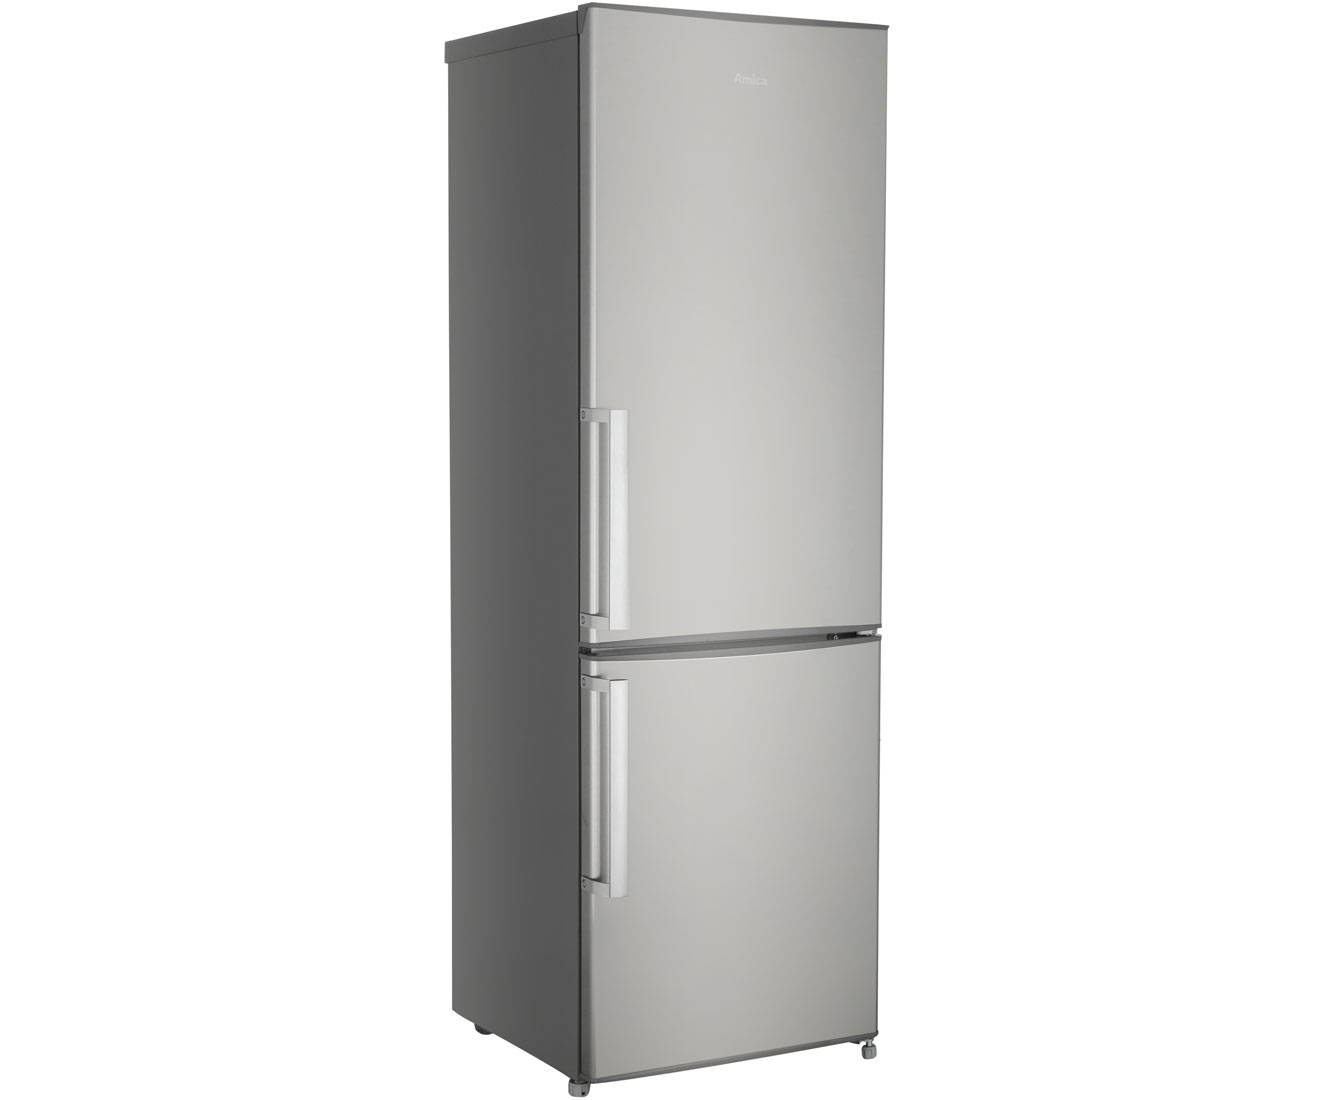 Amica Kühlschrank Bedienungsanleitung : Amica kgc e kühl gefrierkombination edelstahl optik a